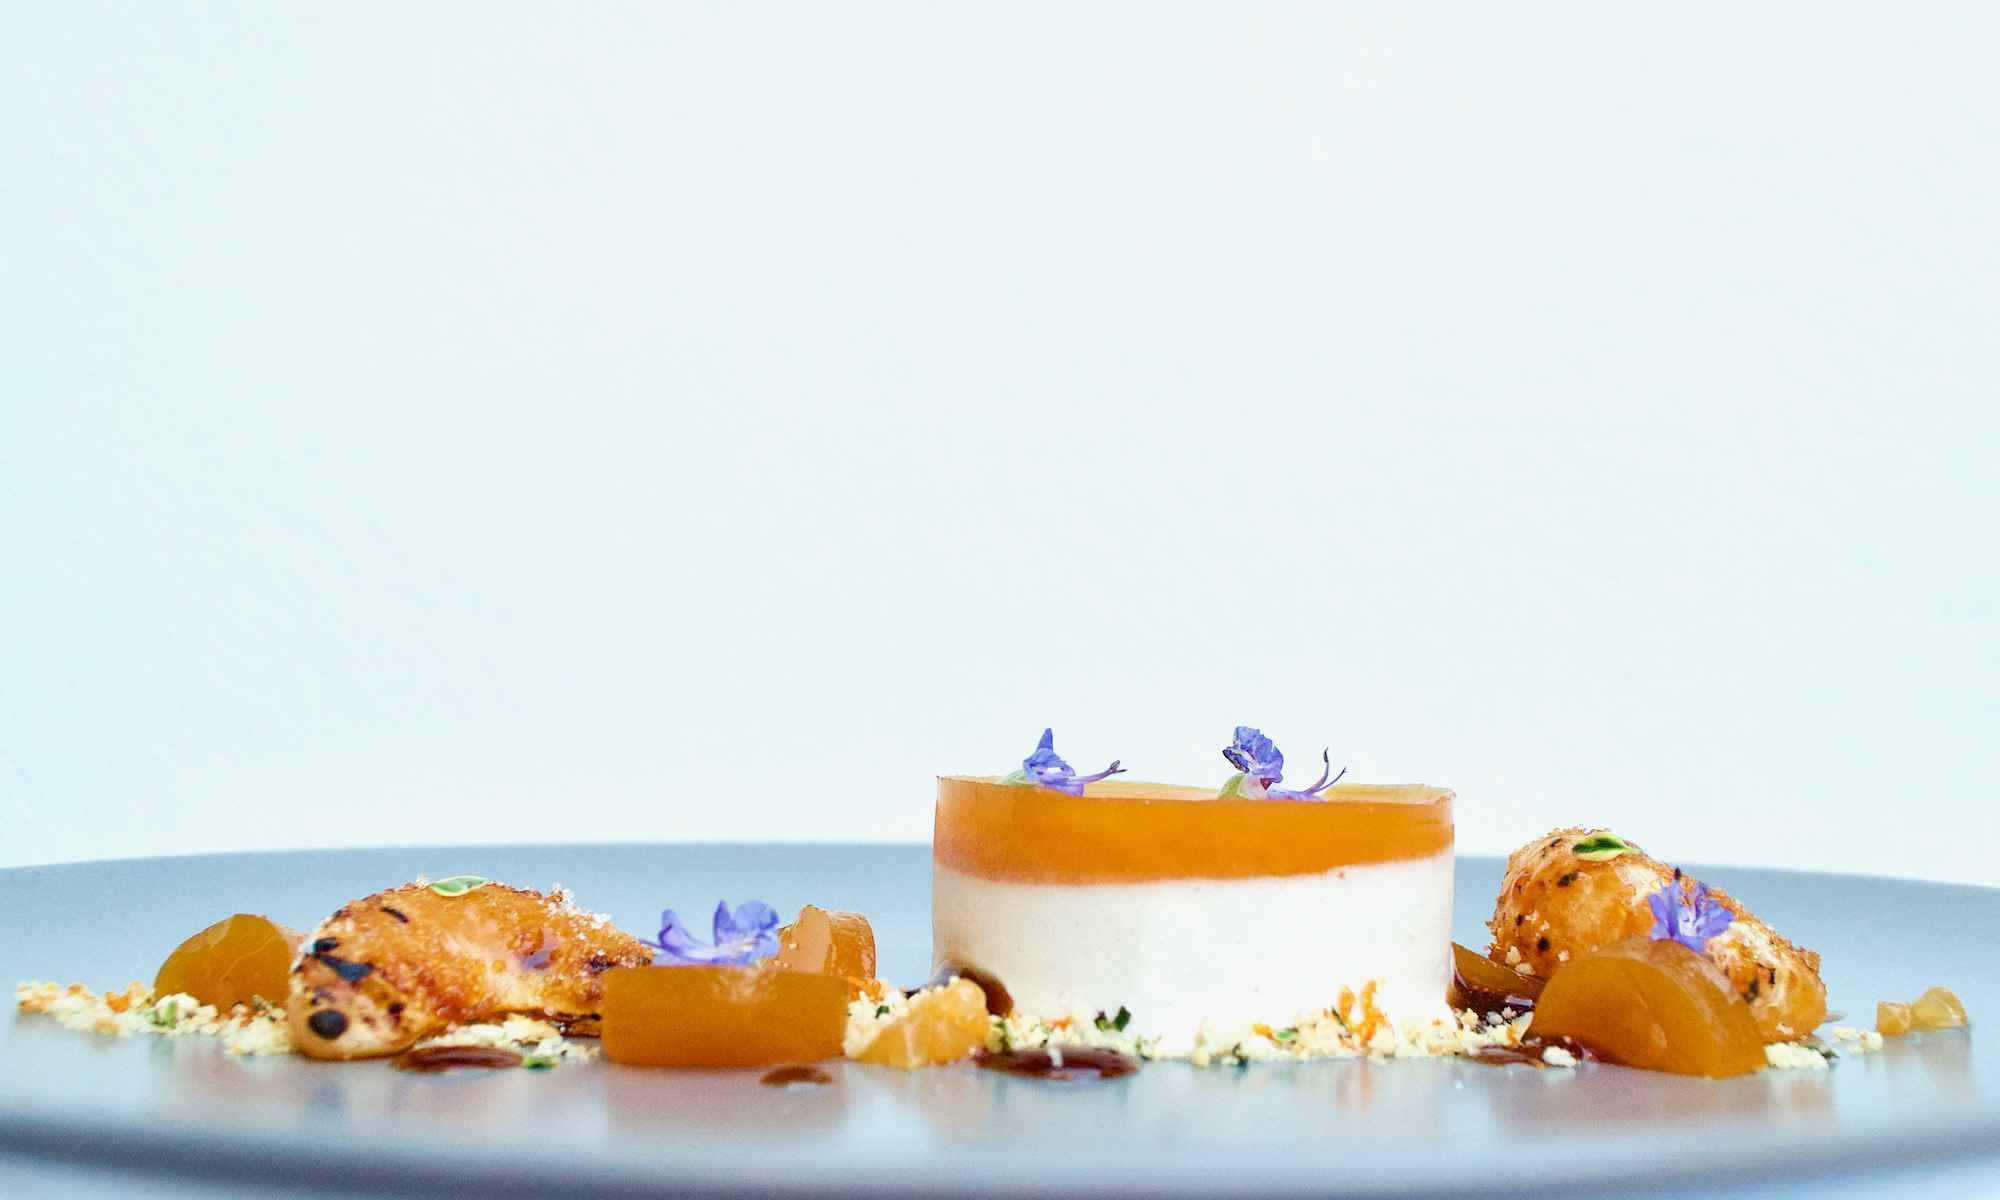 Clementine & Earl Grey tea parfait - Side view - Dessert by Pollensa Private Chefs